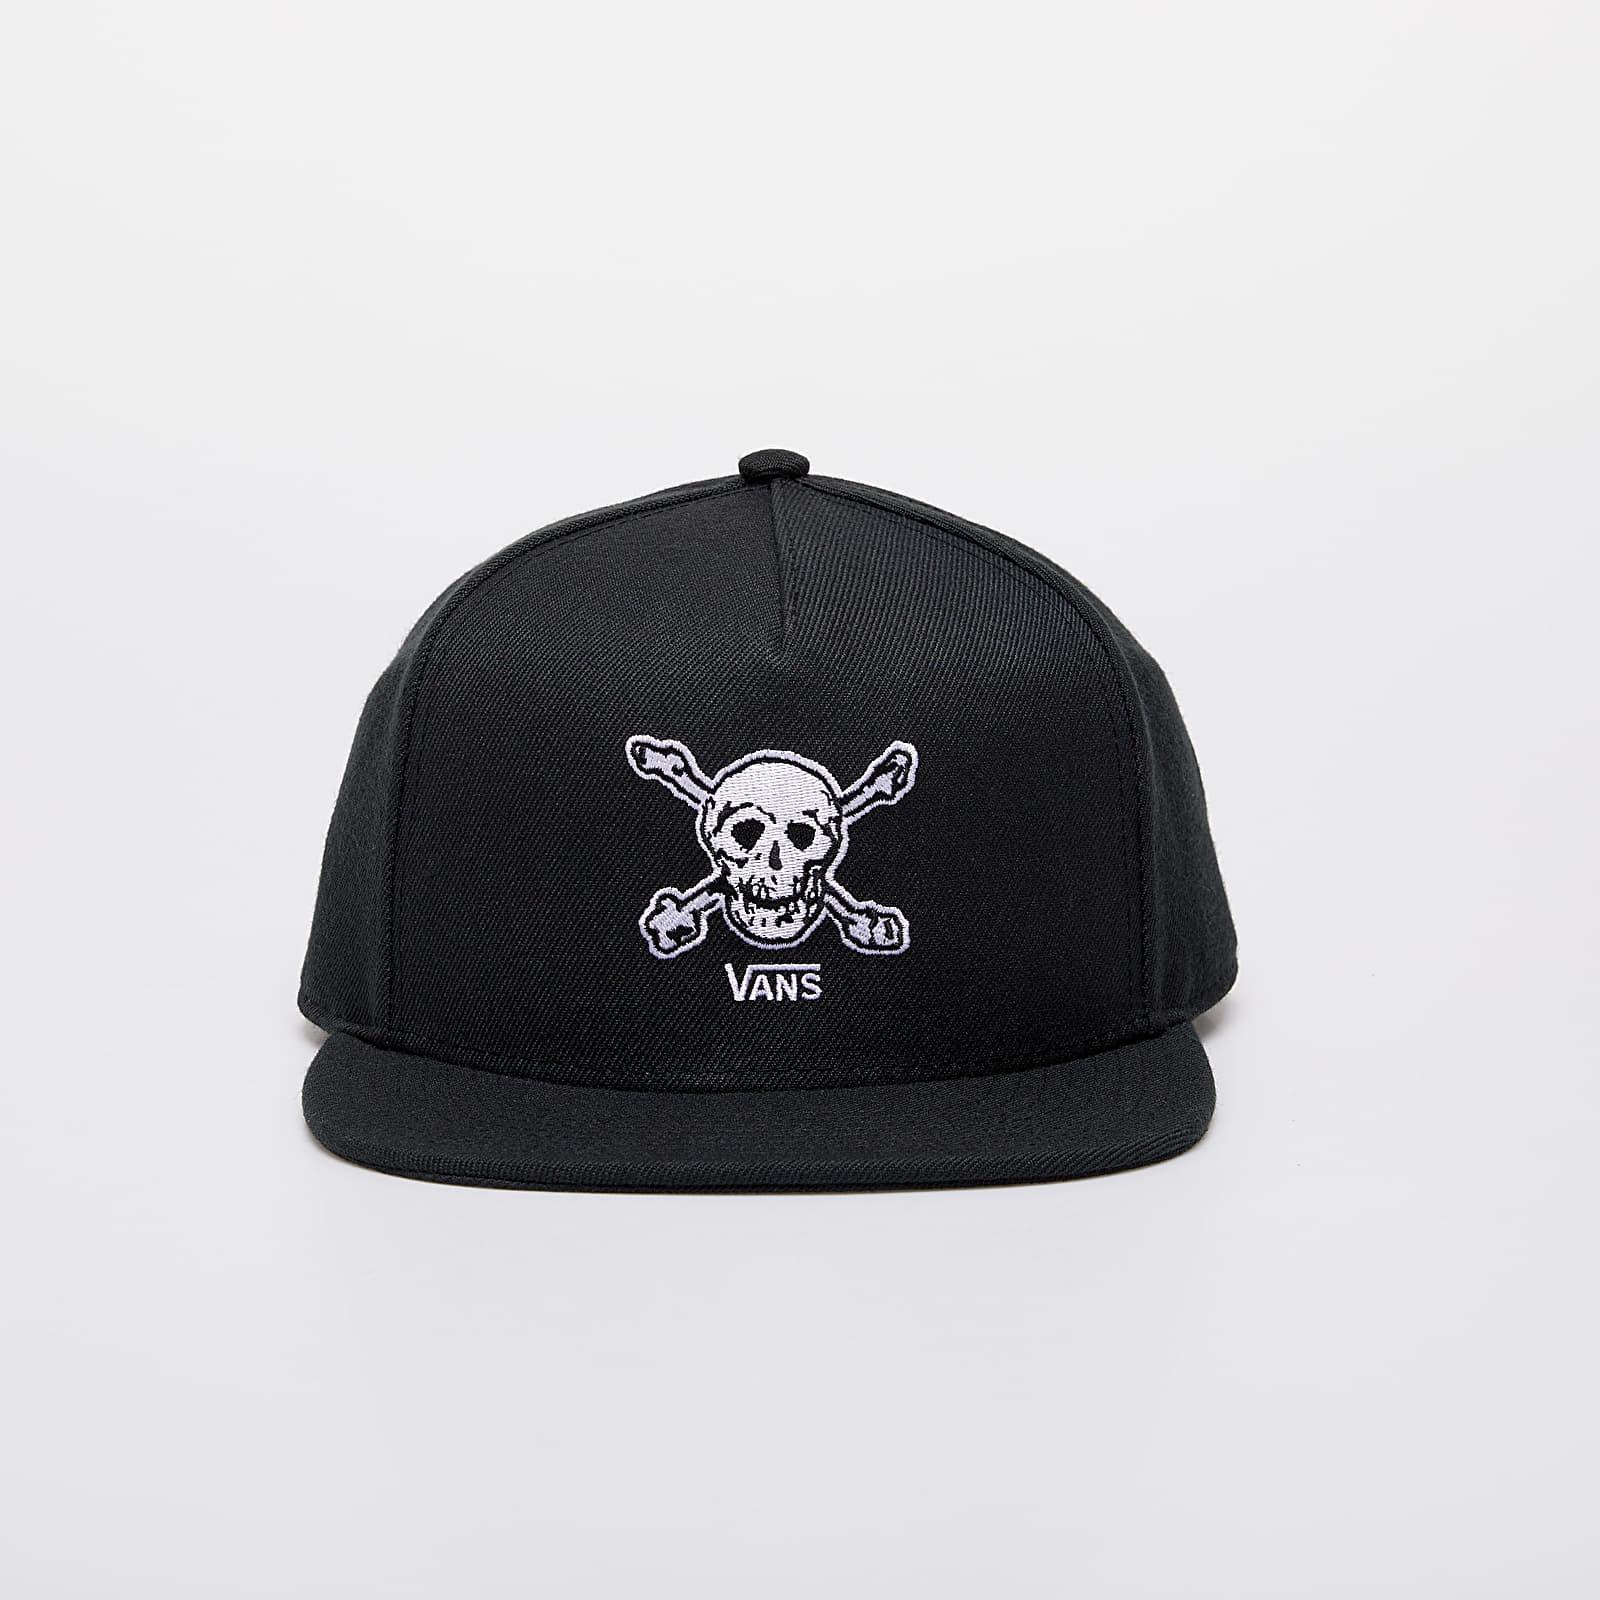 Vans Anaheim Skull Snapback